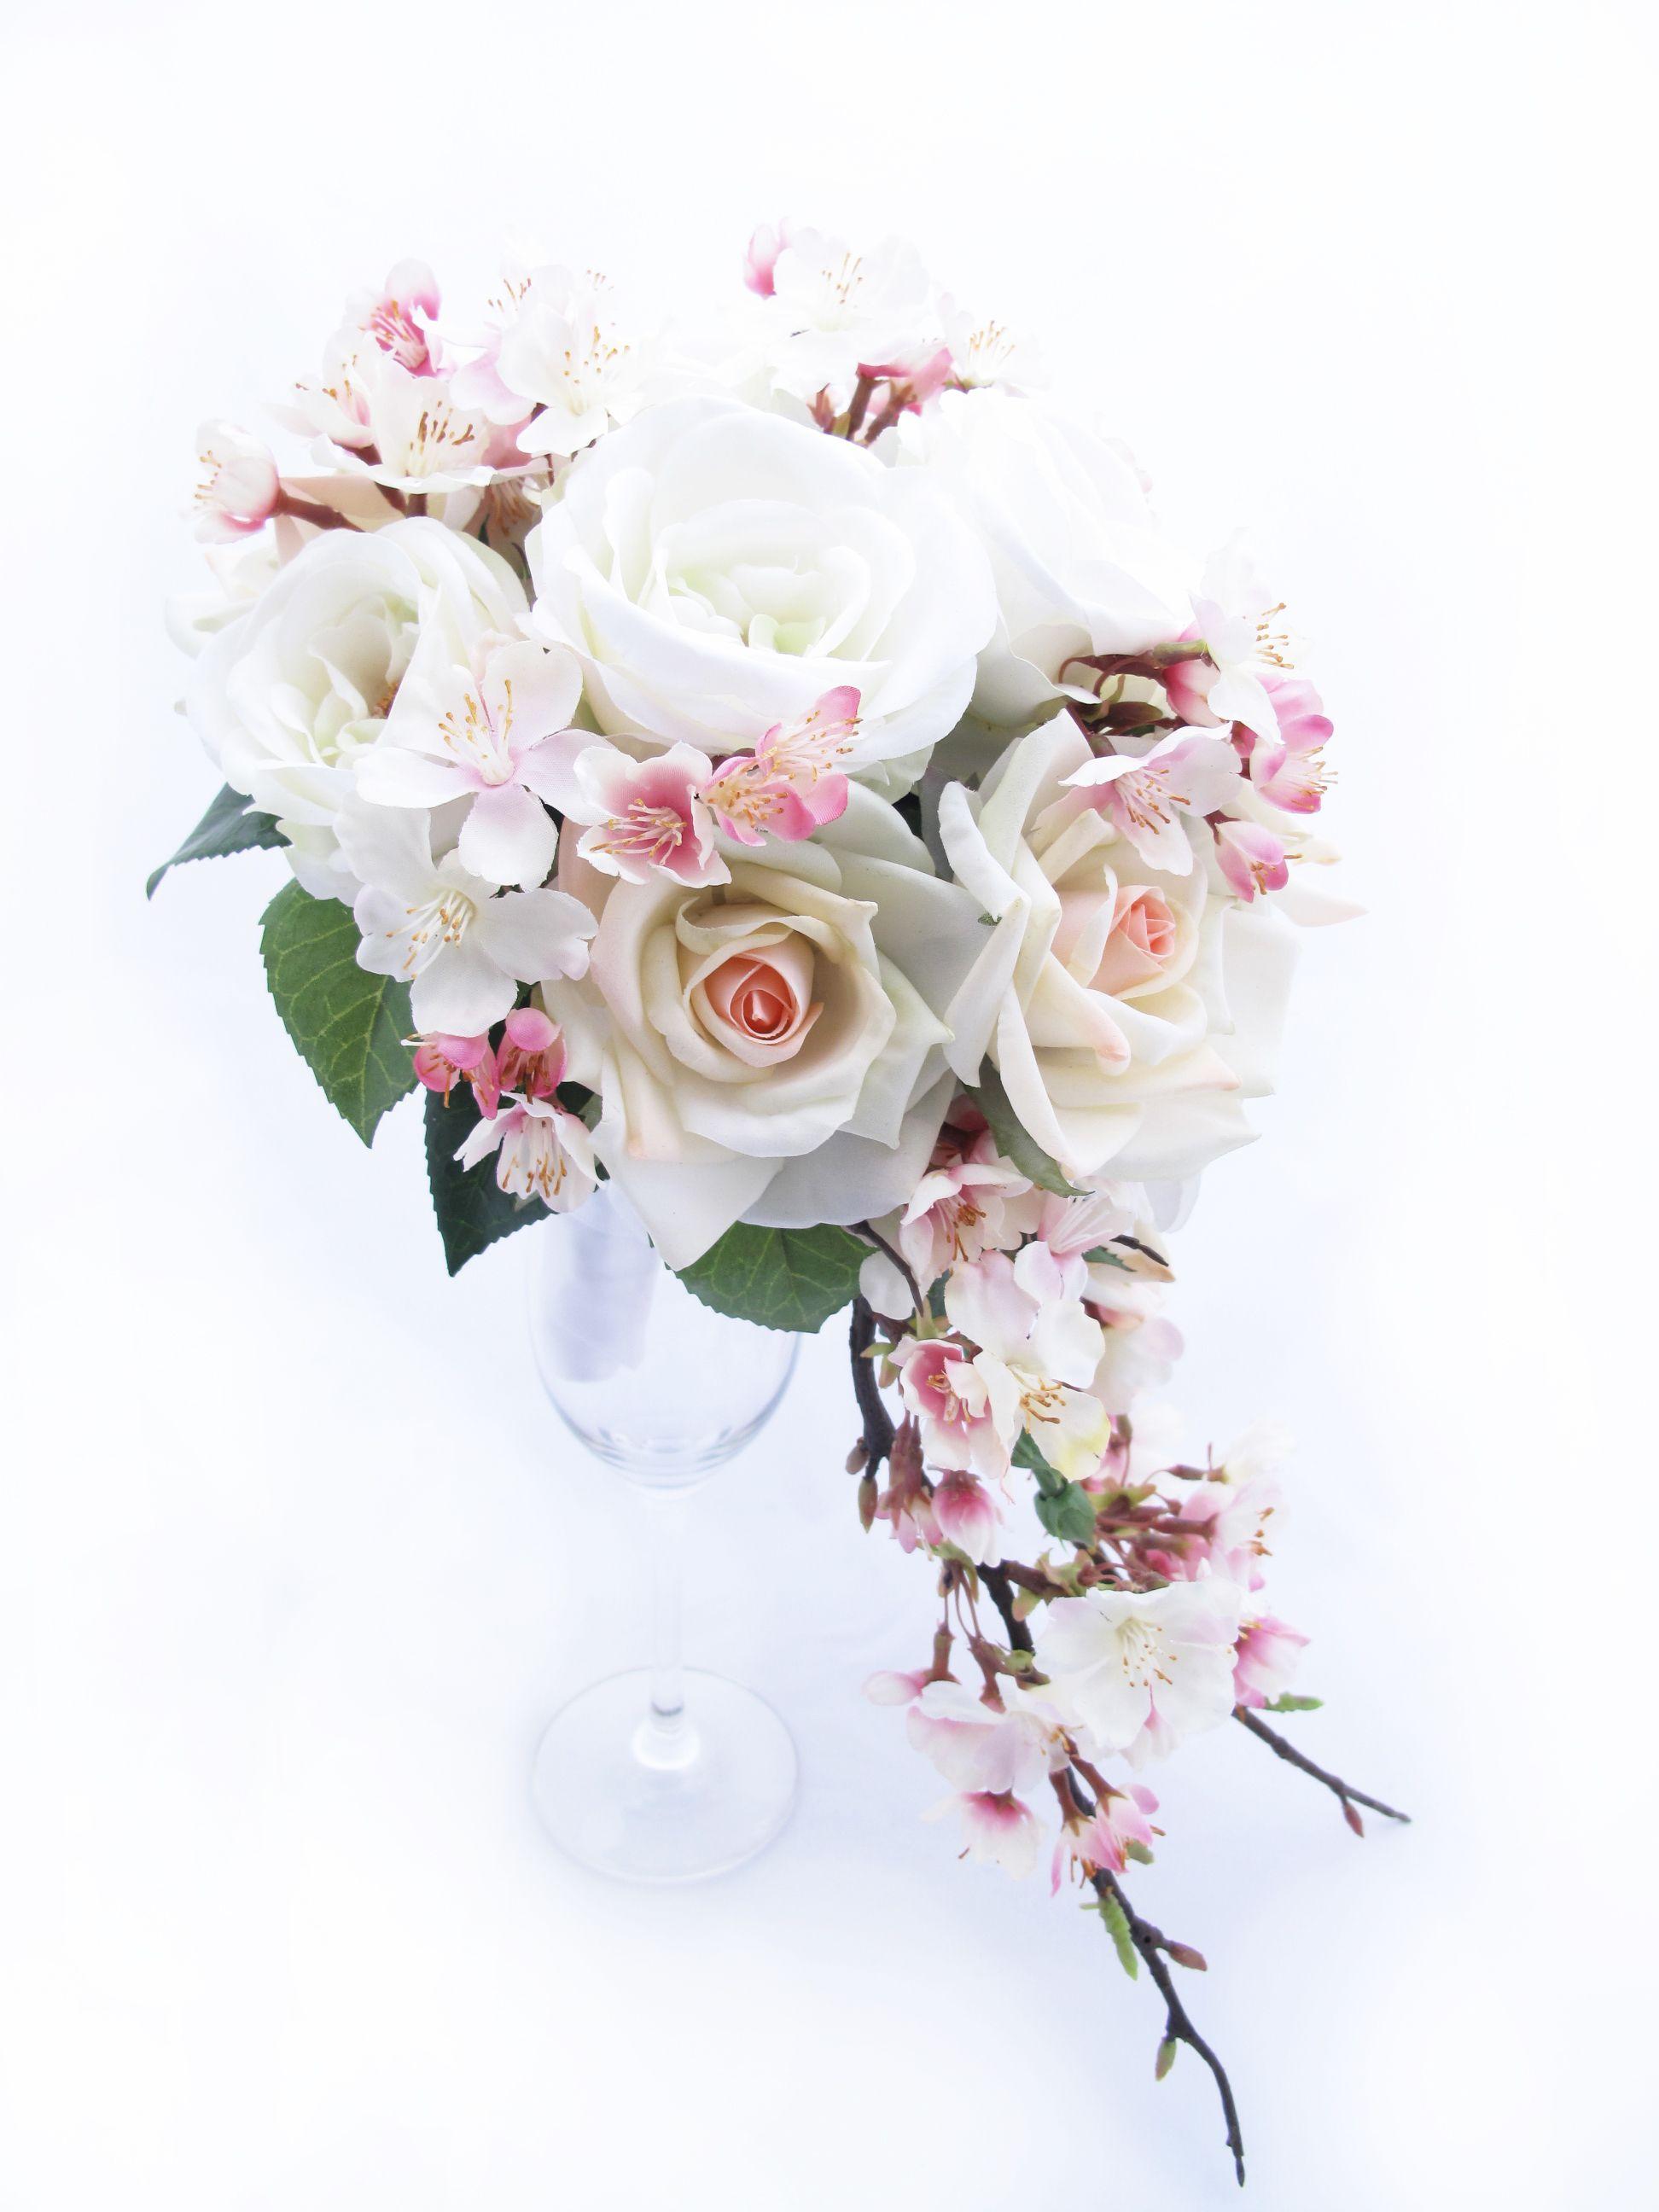 Cherry Blossom Wedding Inspiration | Cherry blossoms, Cherries and Check